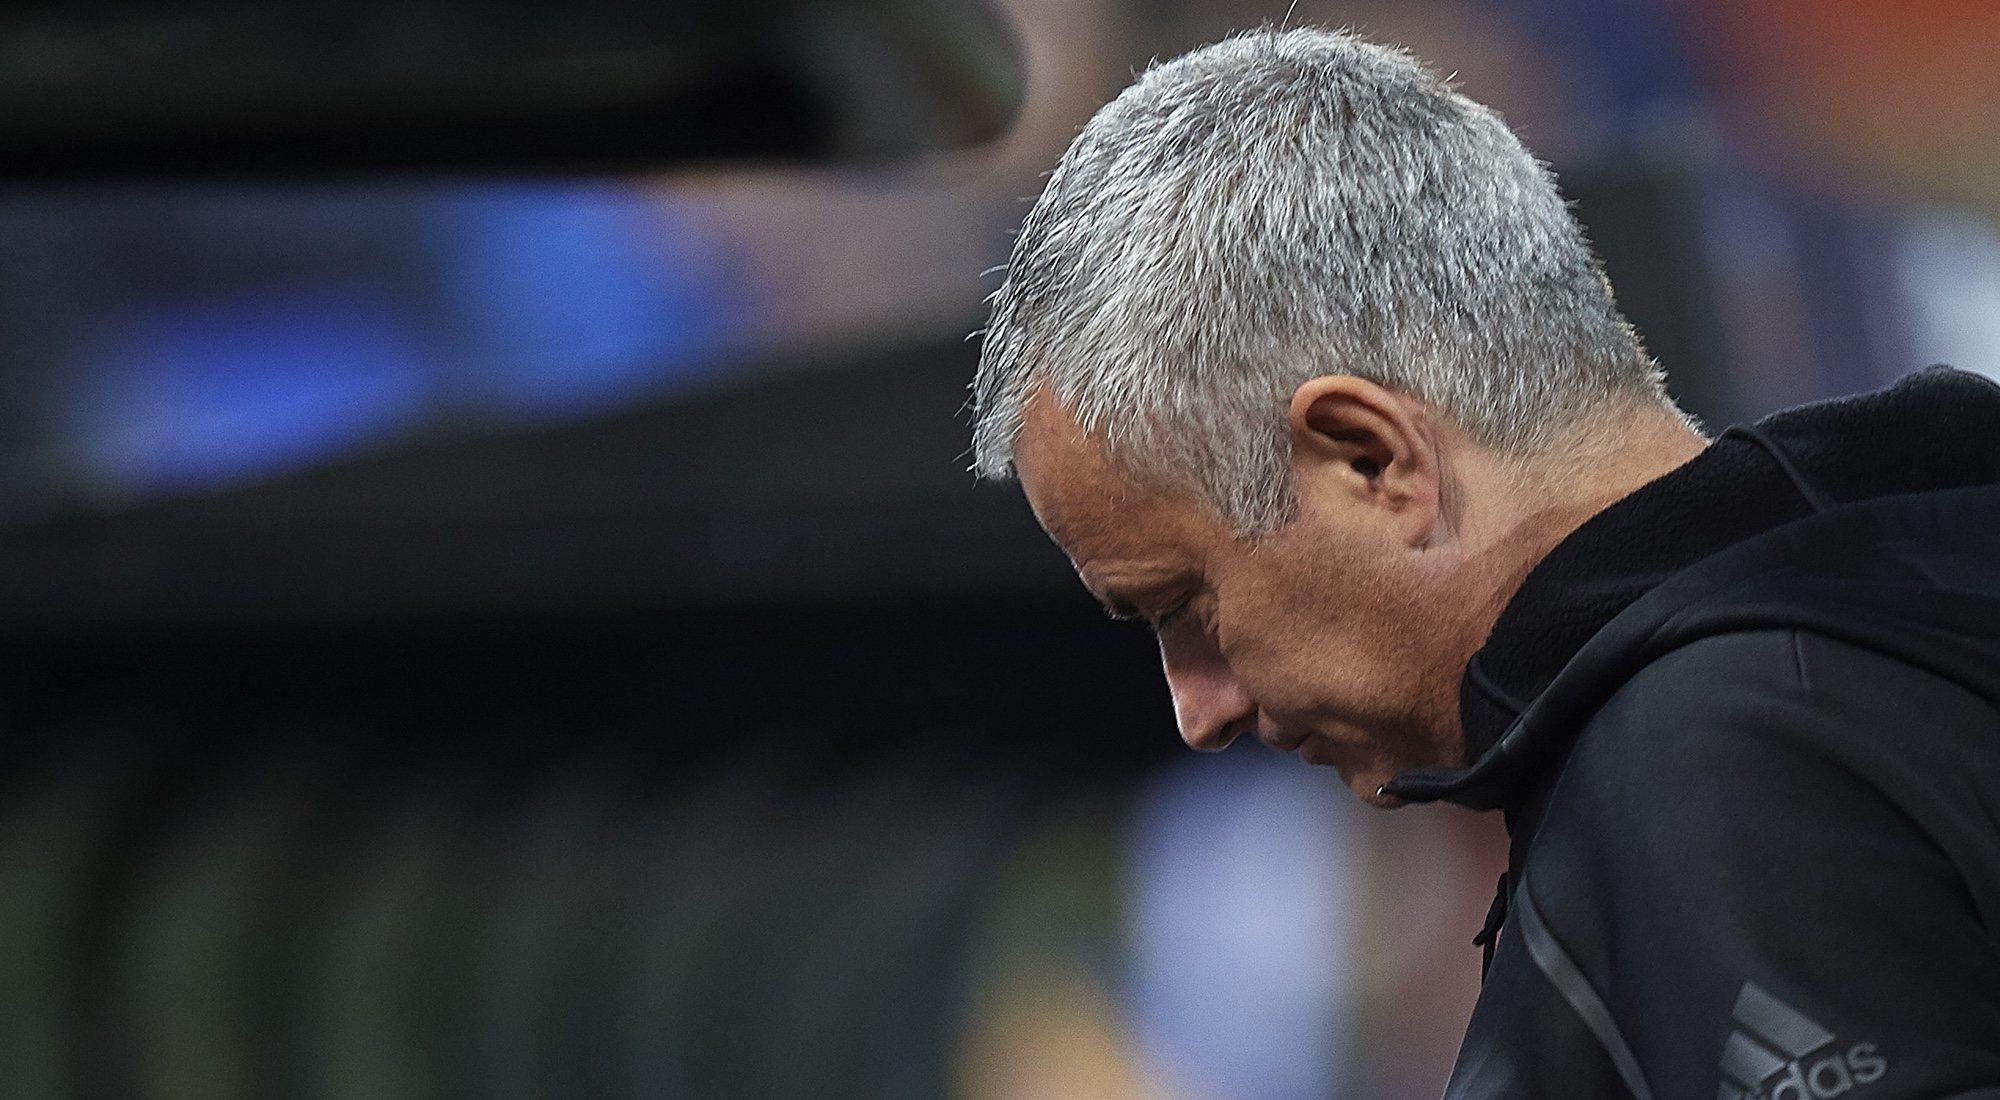 Auge y caída de José Mourinho